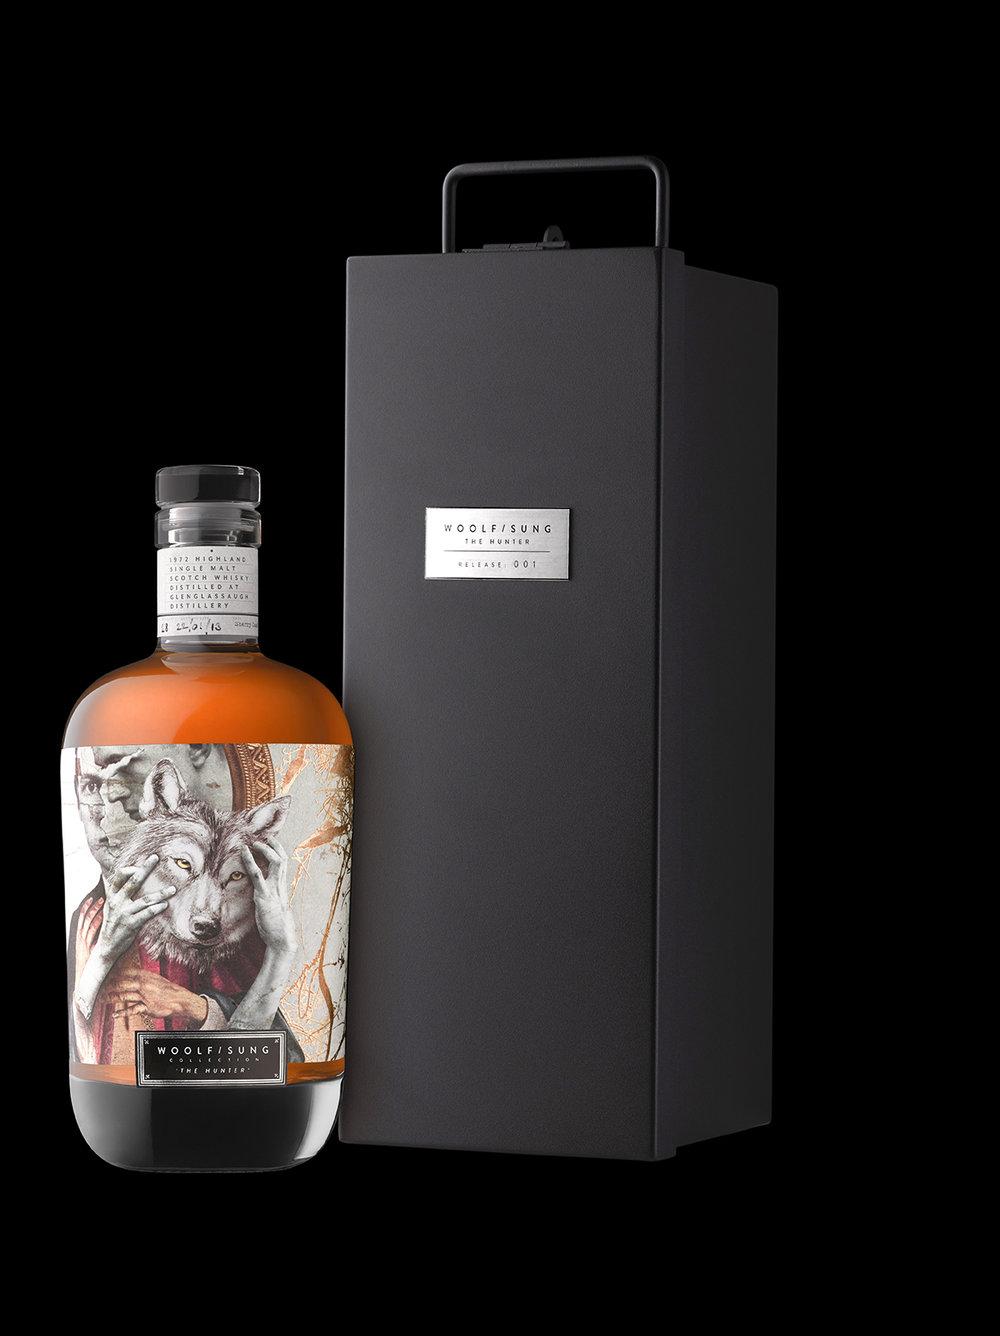 WoolfSung_Ltd_Ed_Box_bottle_on_black.jpg